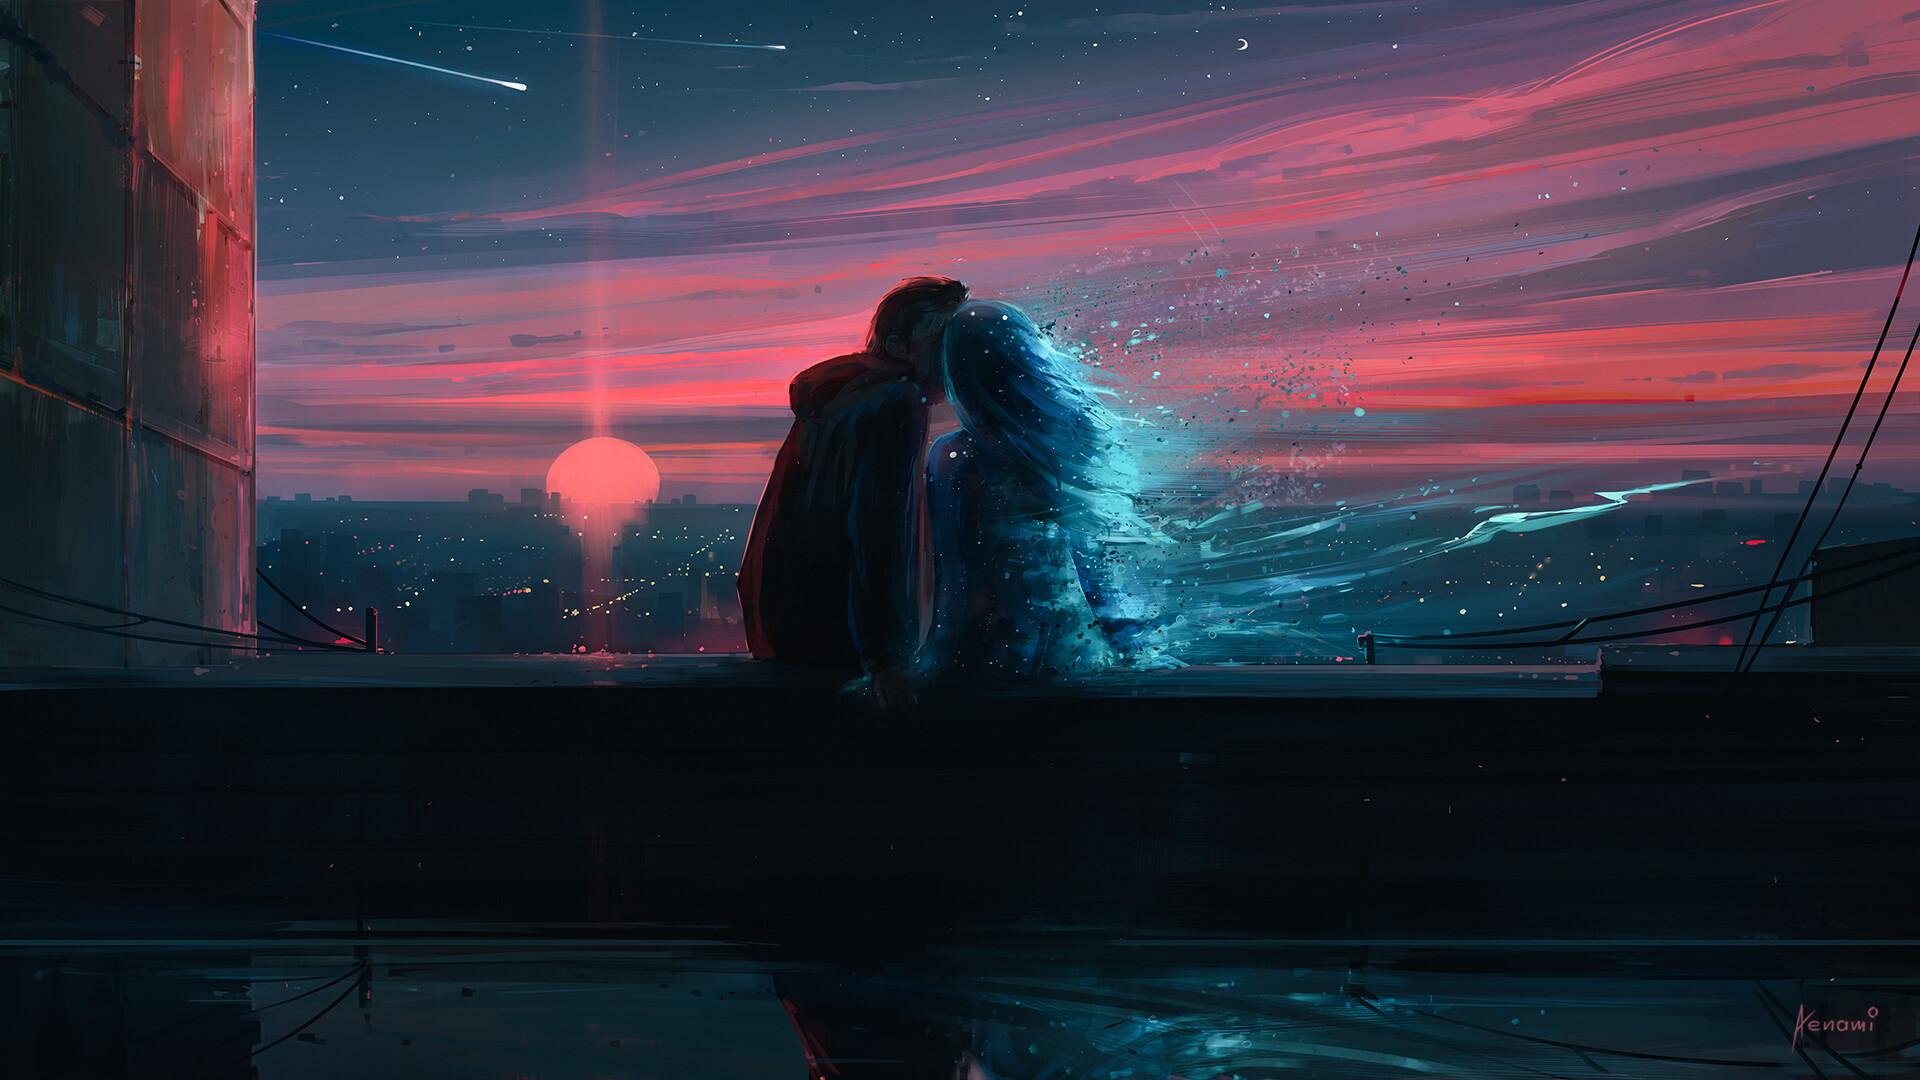 General 1920x1080 Aenami artwork digital art sunset couple shooting stars nightride